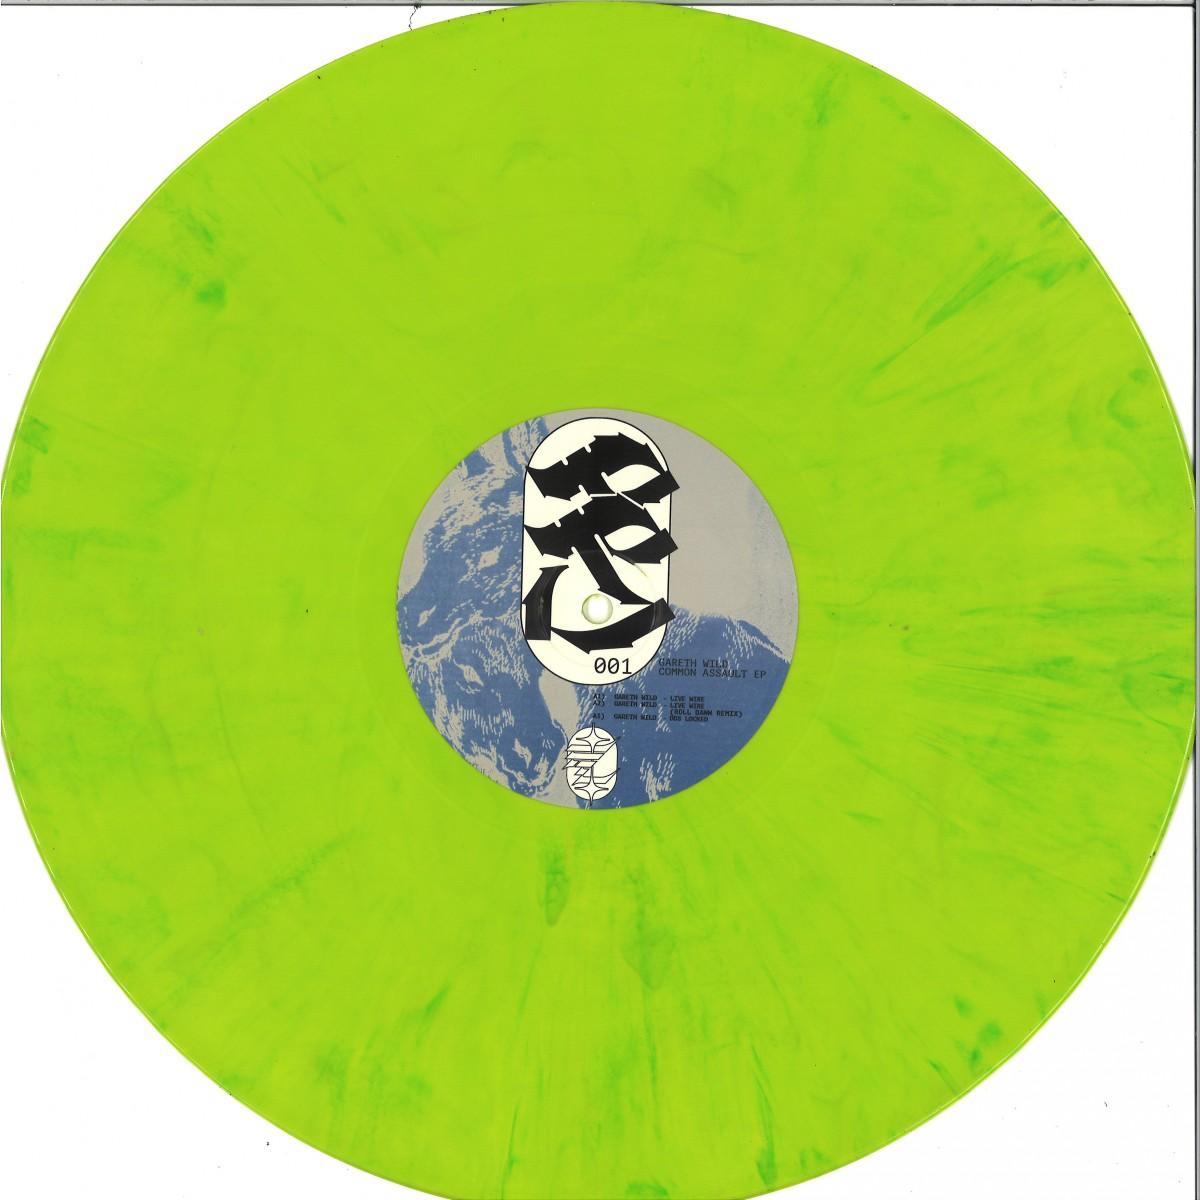 Gareth Wild - Common Assault / Fold Records FLD001 - Vinyl